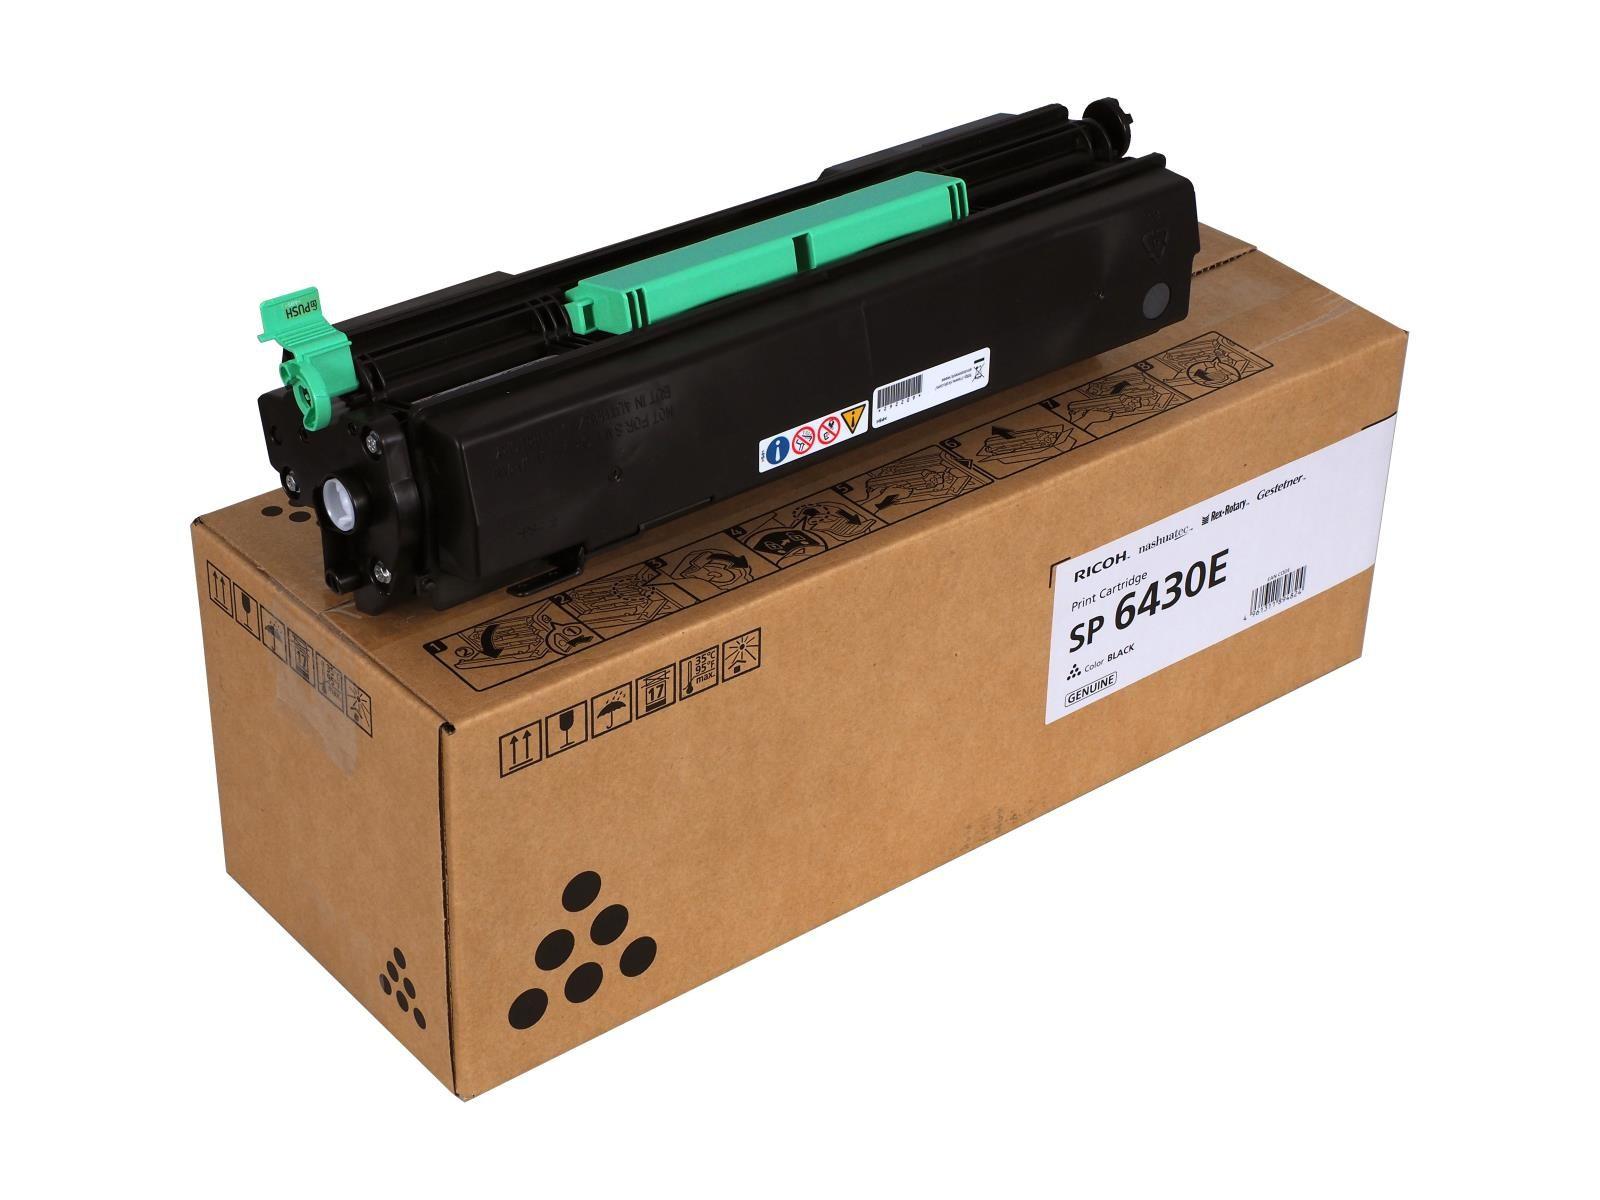 Ricoh SP 6430DN/SP 6430E/TONSP 6430 Toner - festékkazetta 10K fekete (Black), eredeti